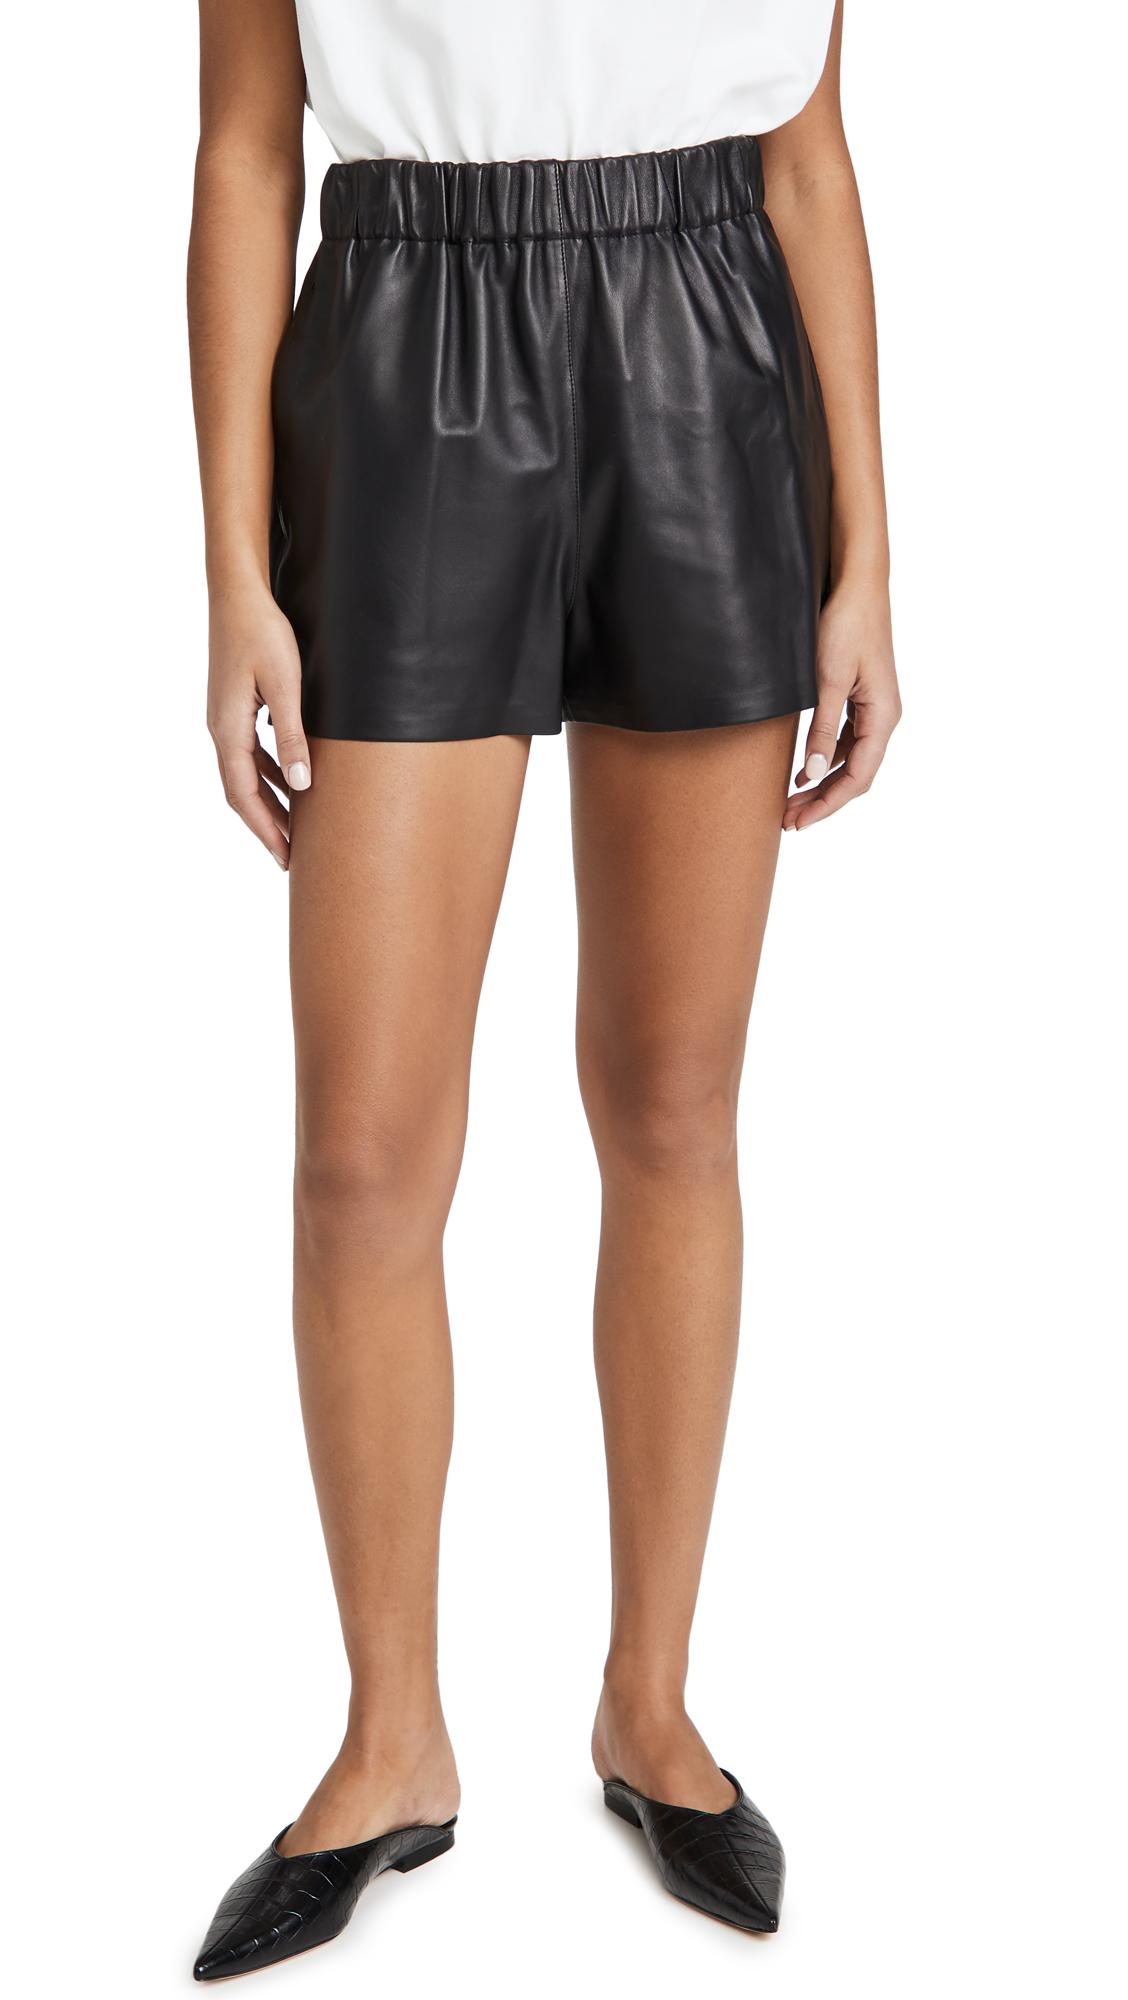 Tibi Leather Pull On Shorts